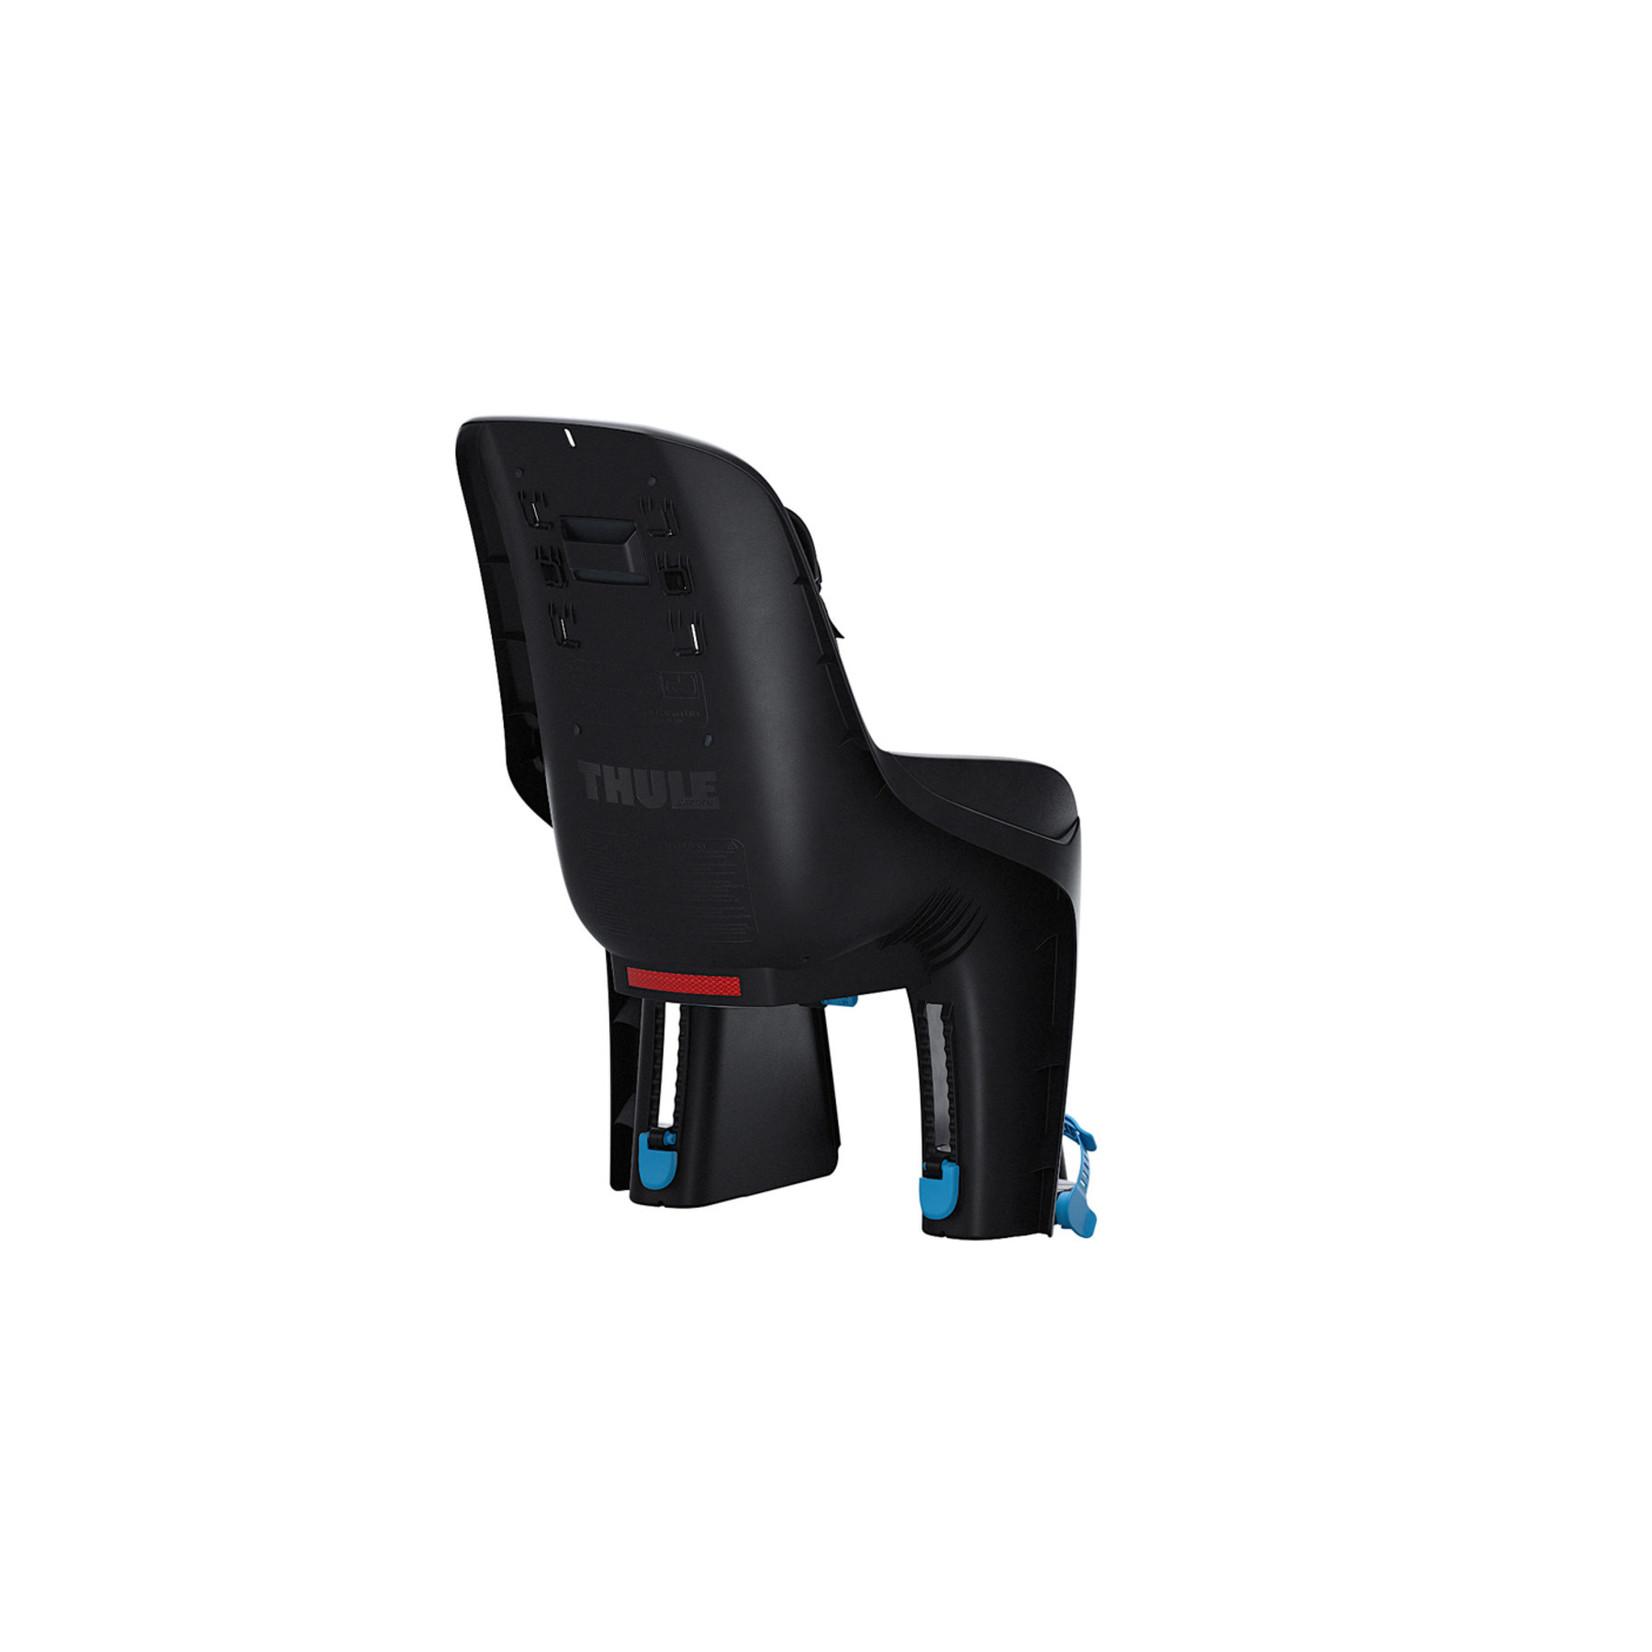 THULE RideAlong Lite Child Seat